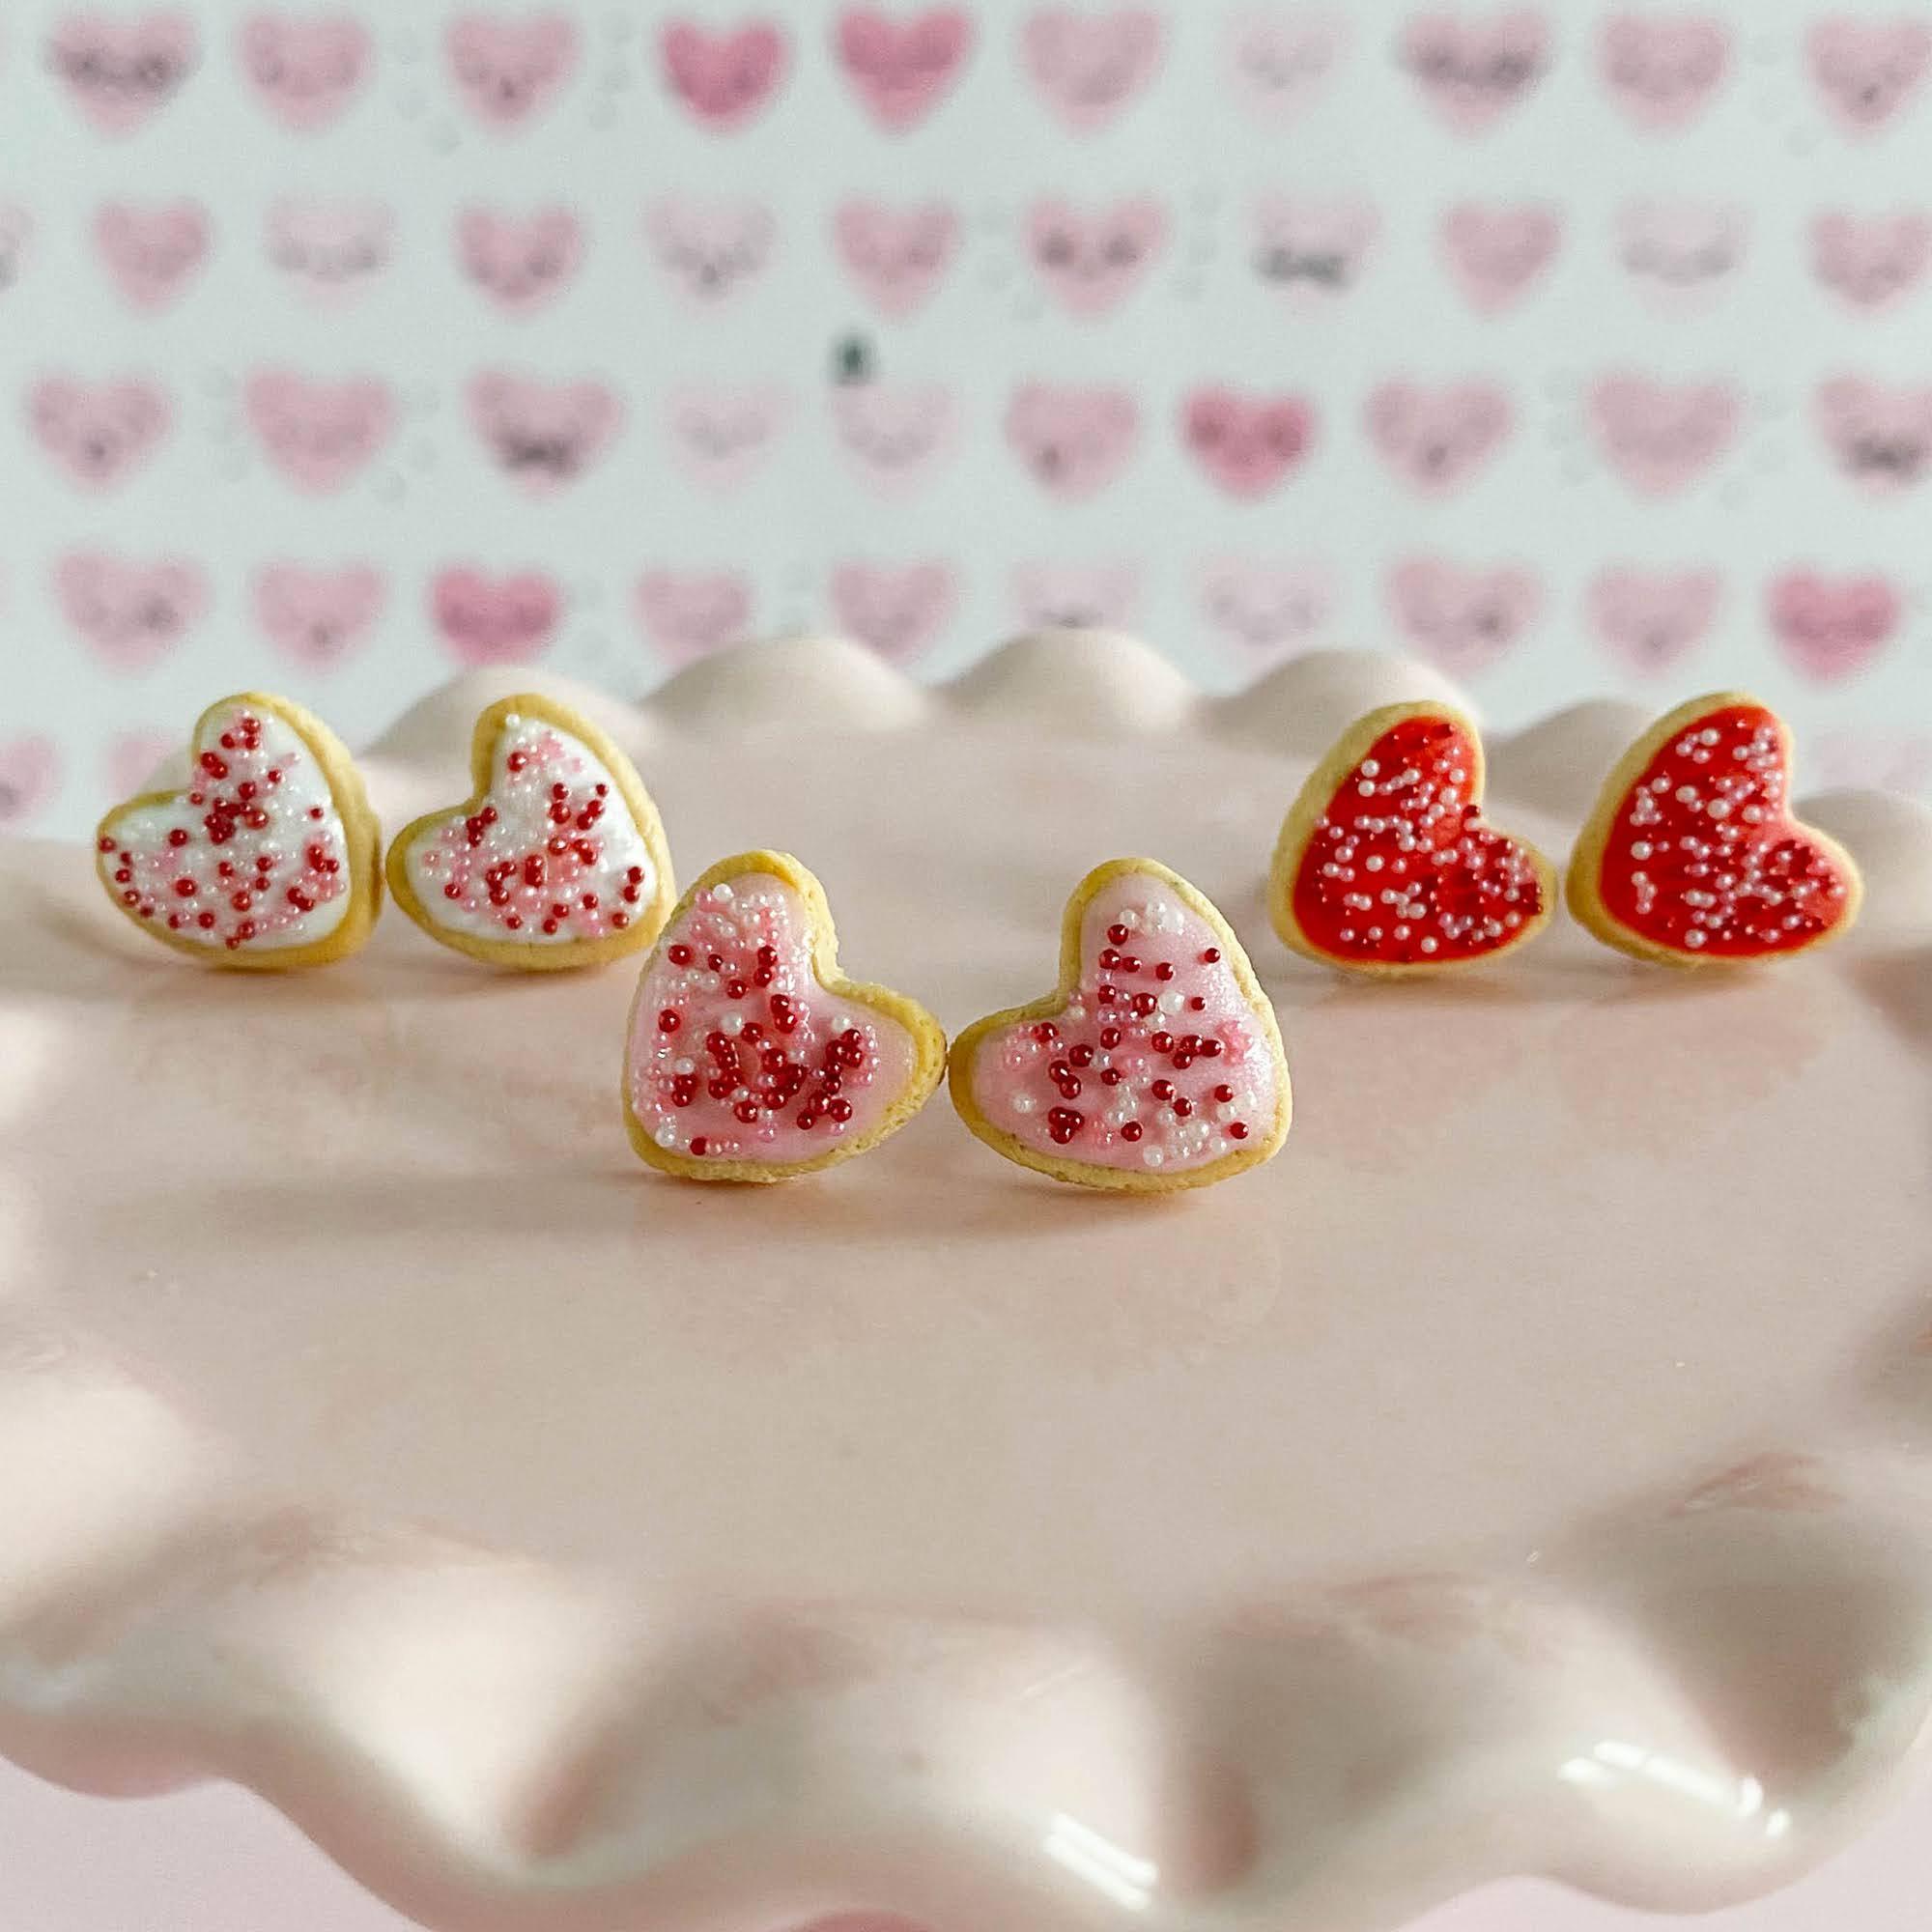 fireflyFrippery Heart Sugar Cookie Earrings on Pink Display